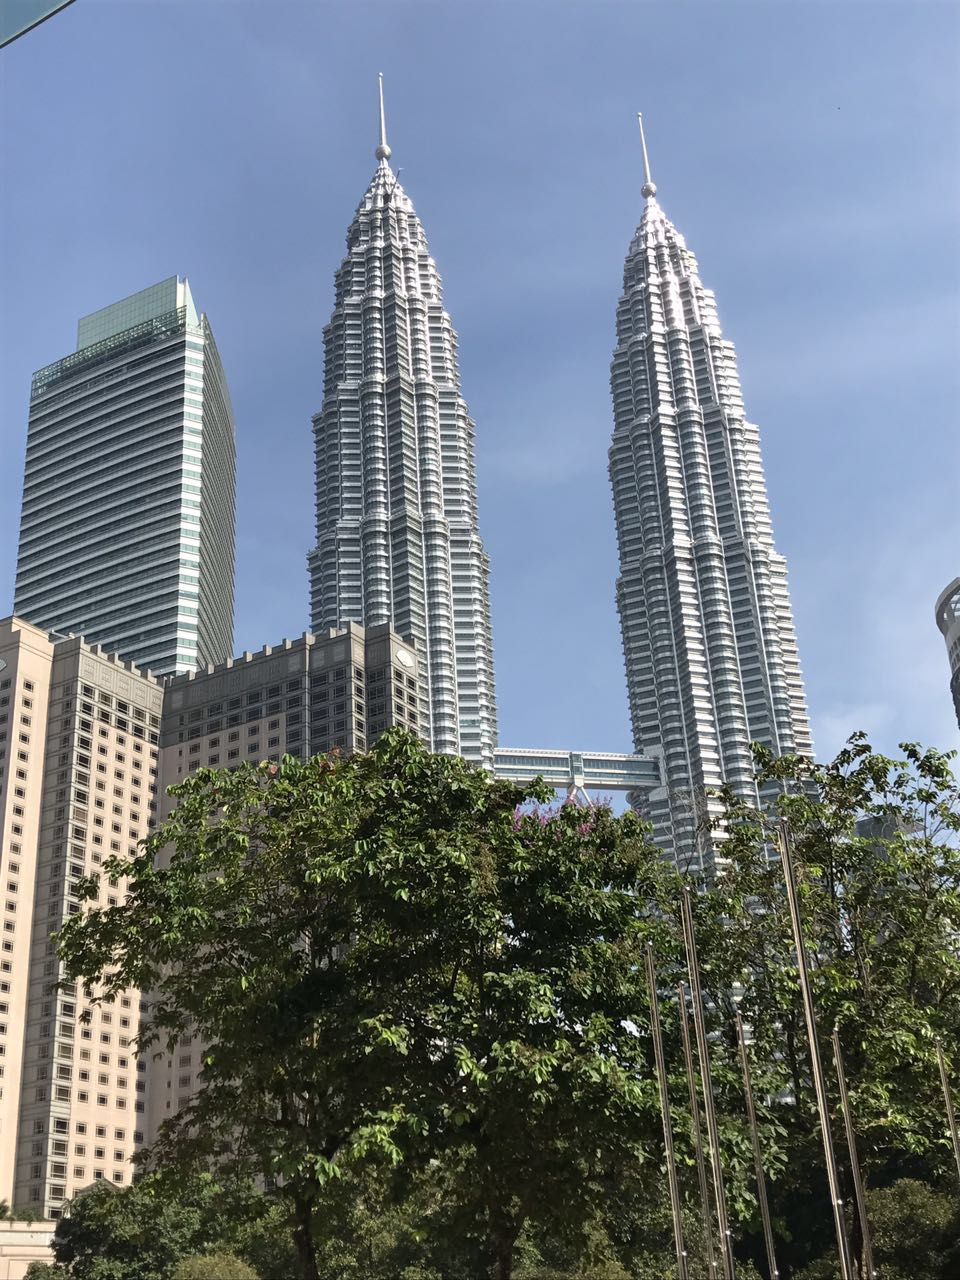 Visting tour to Malaysia